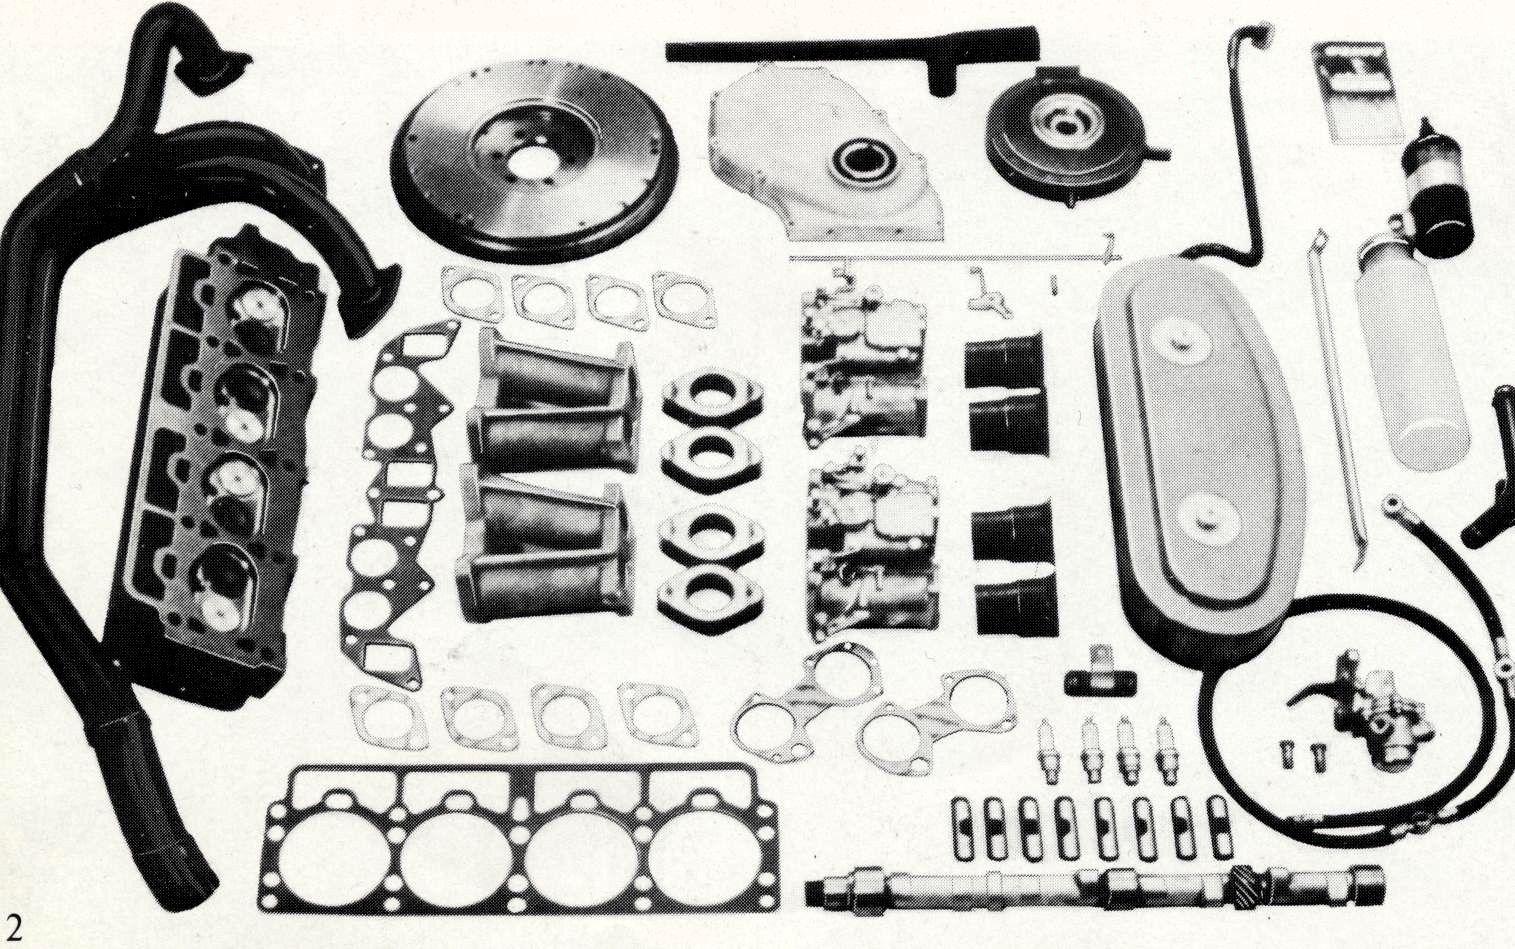 Volvo B20 tuning kit Stage II, 160 hp | Volvo | Volvo cars